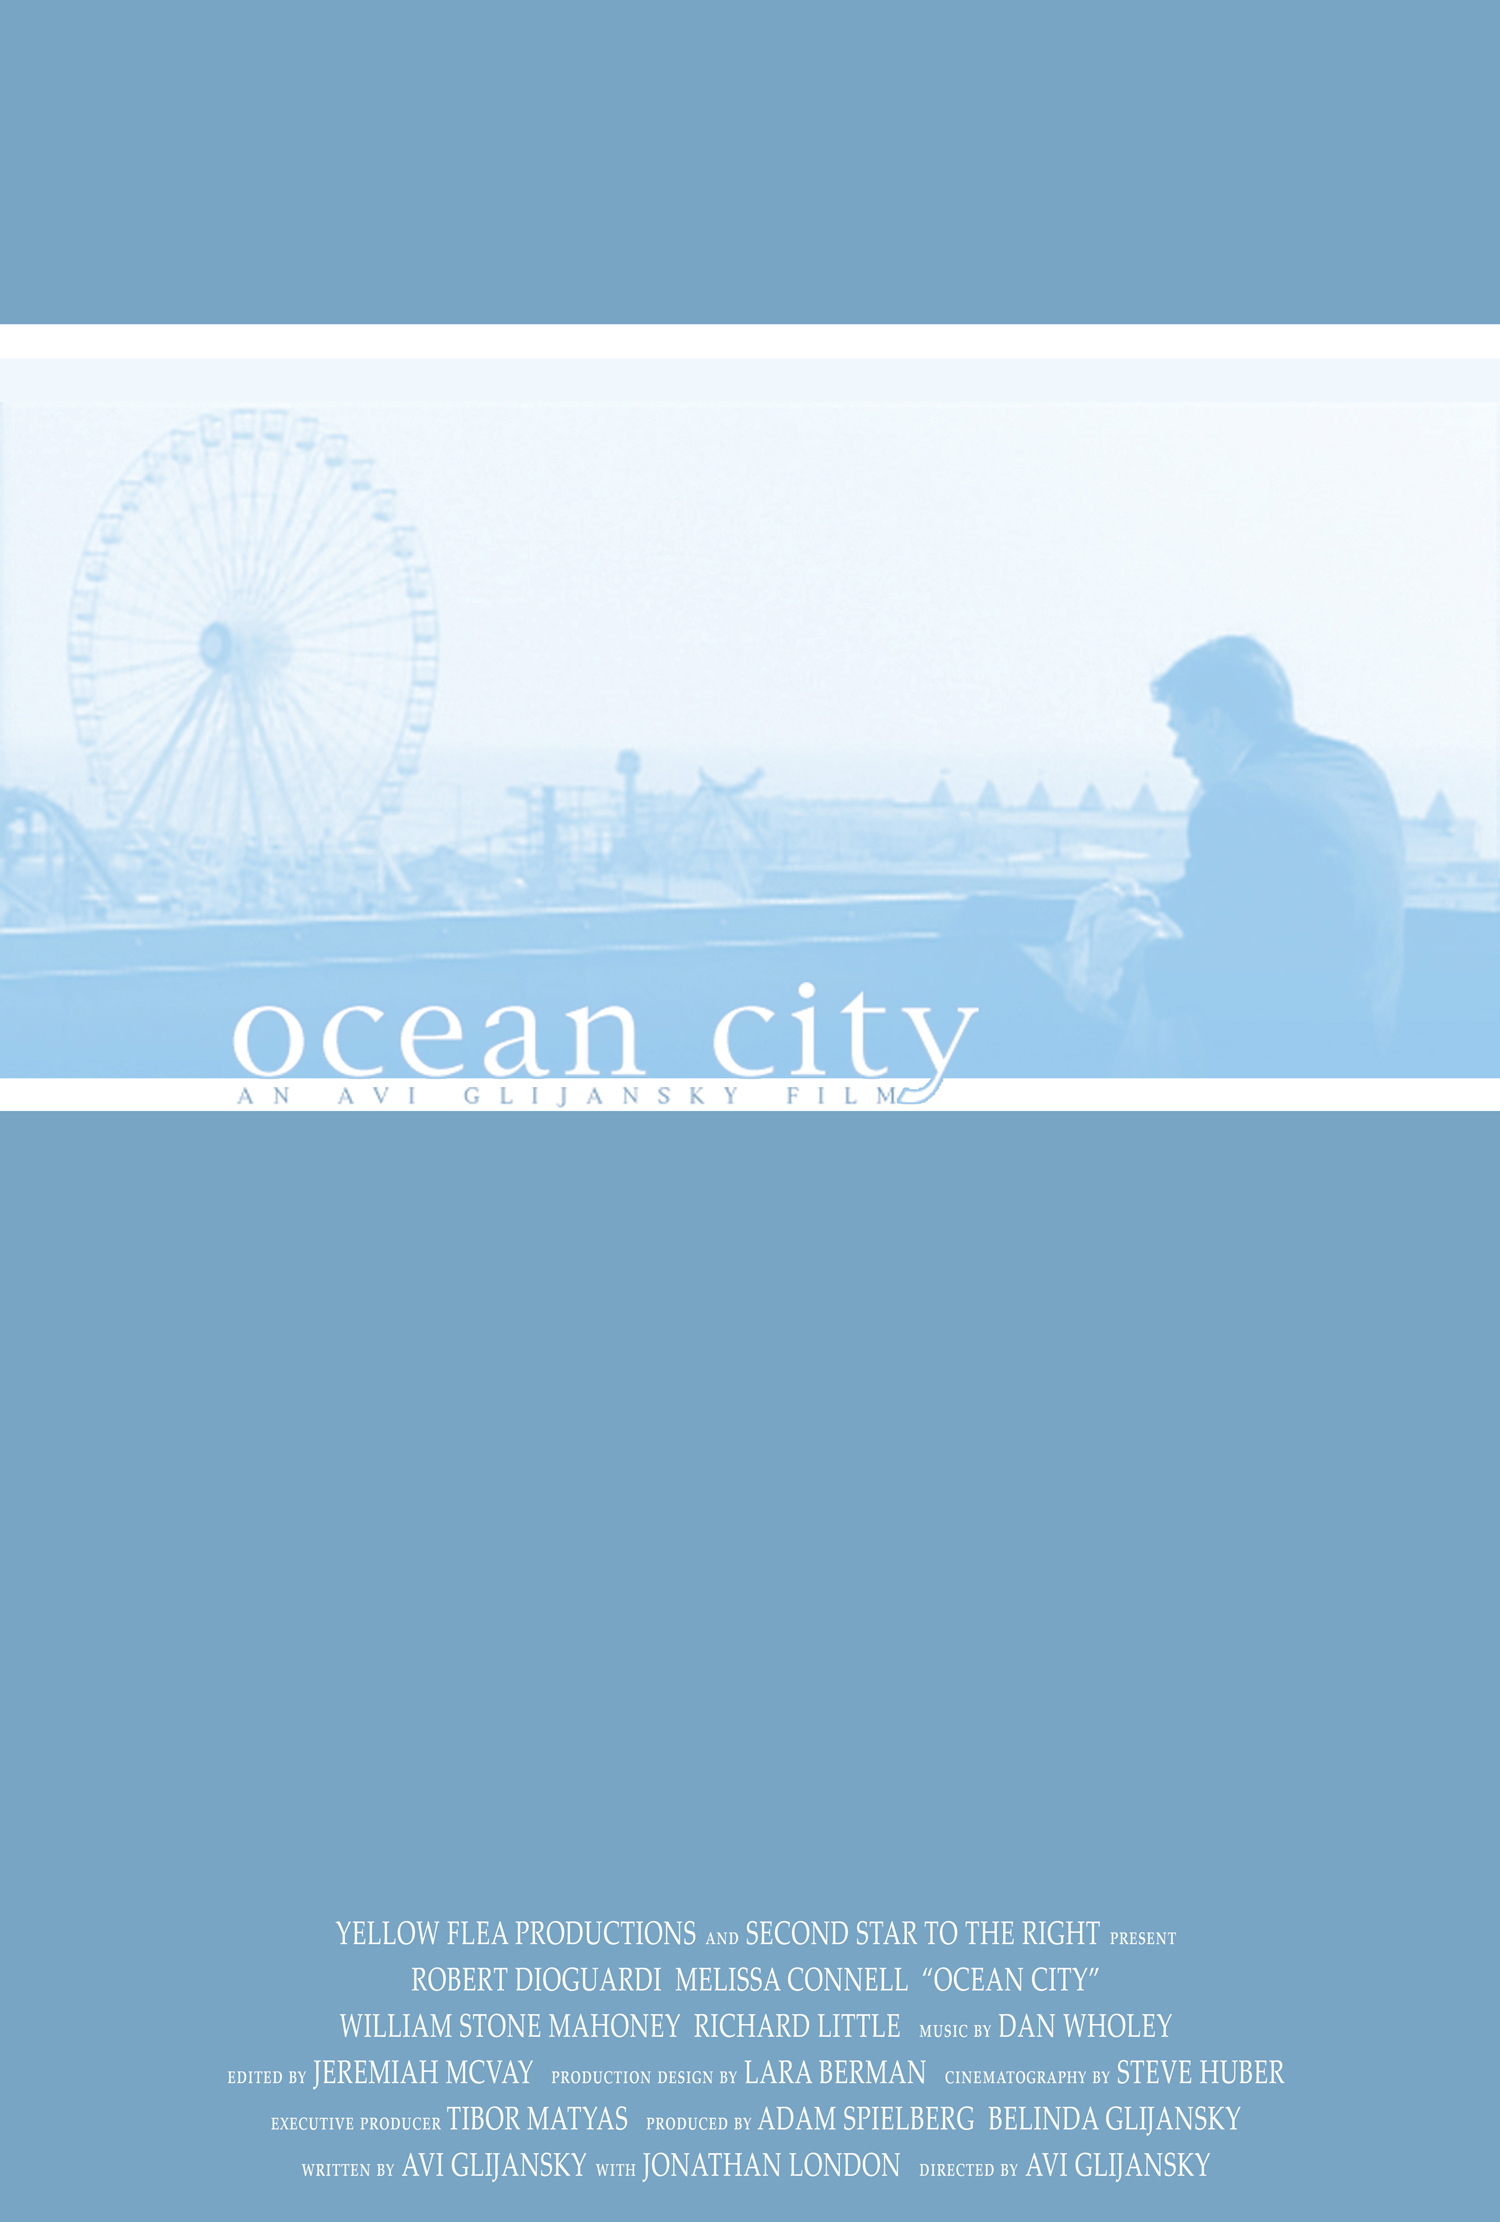 Ocean City_One Sheet_1500x72_Optv1.jpg